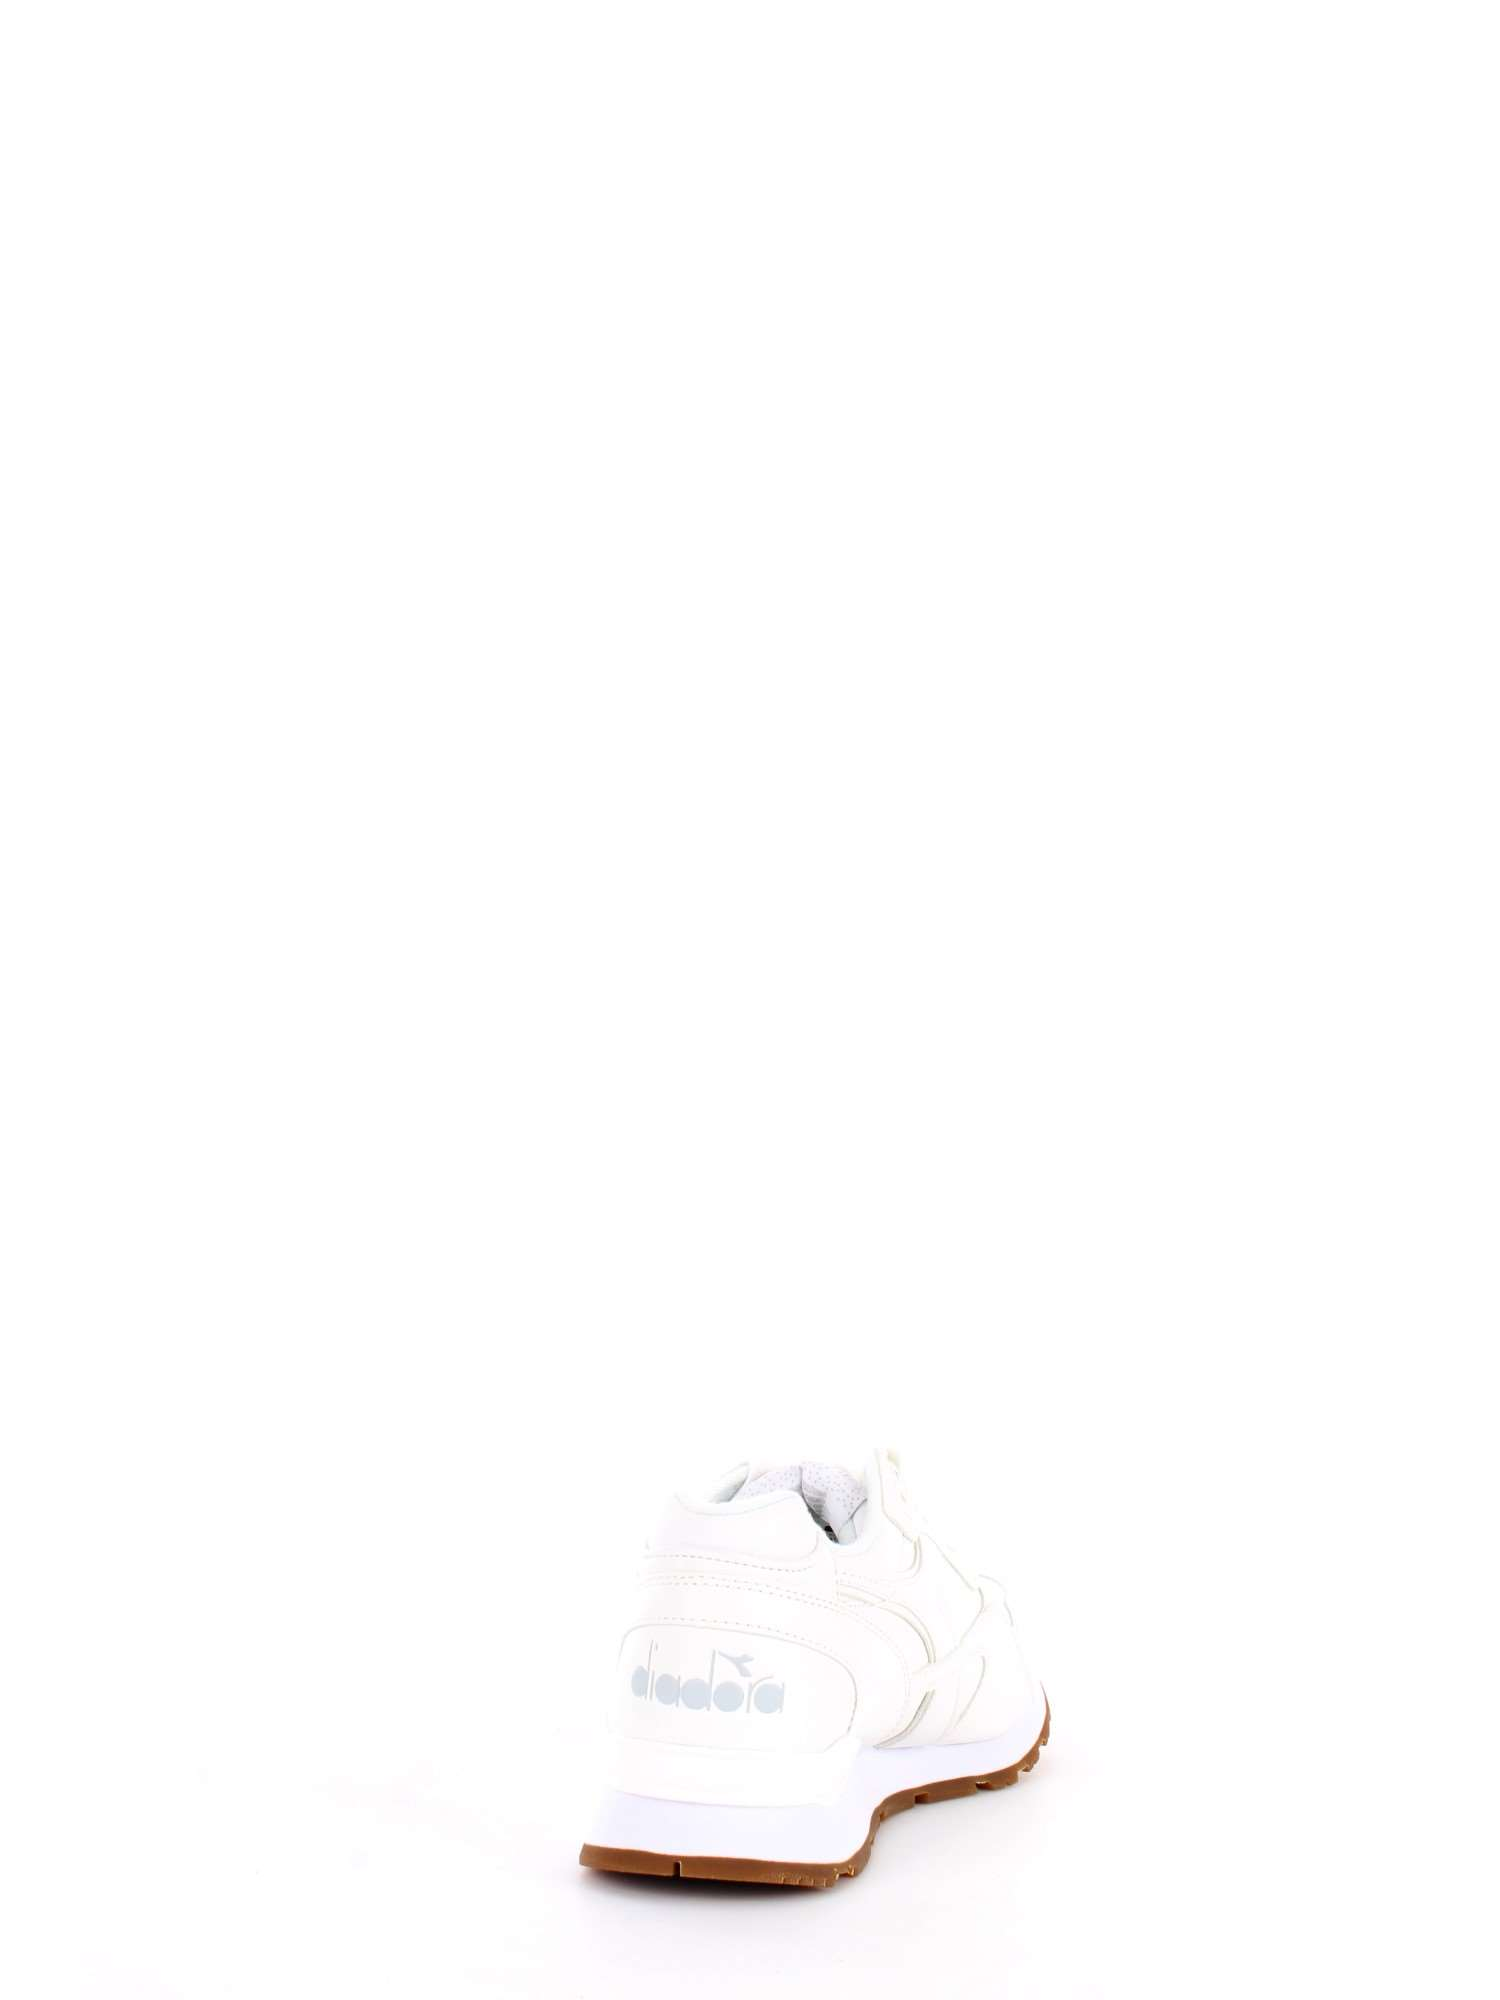 t White hommes Sneakers 173744 Diadora pour Printemps 20006 4q0pzwvp